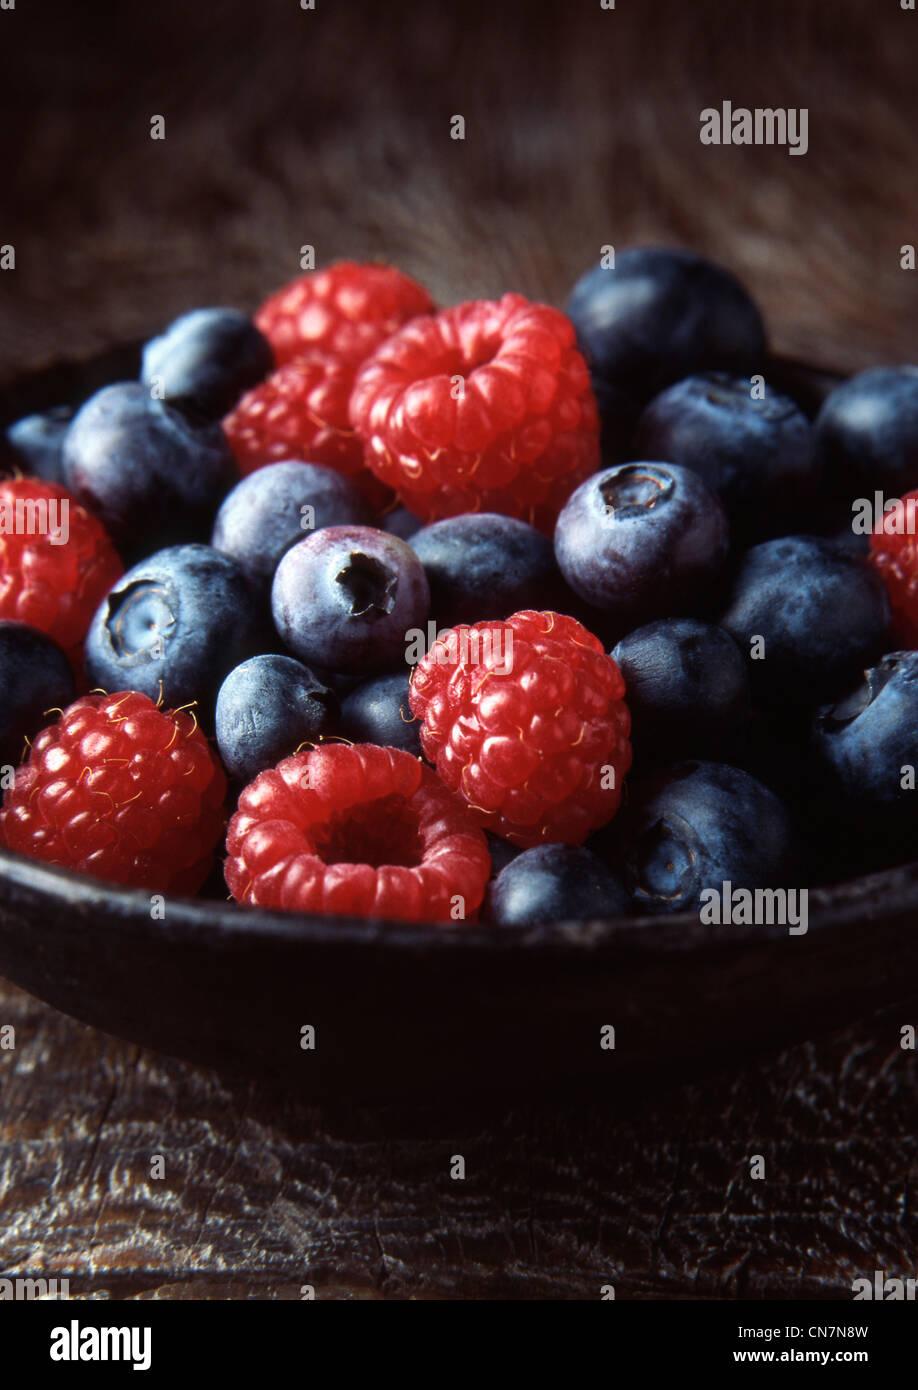 Schüssel mit Heidelbeeren und Erdbeeren Stockbild